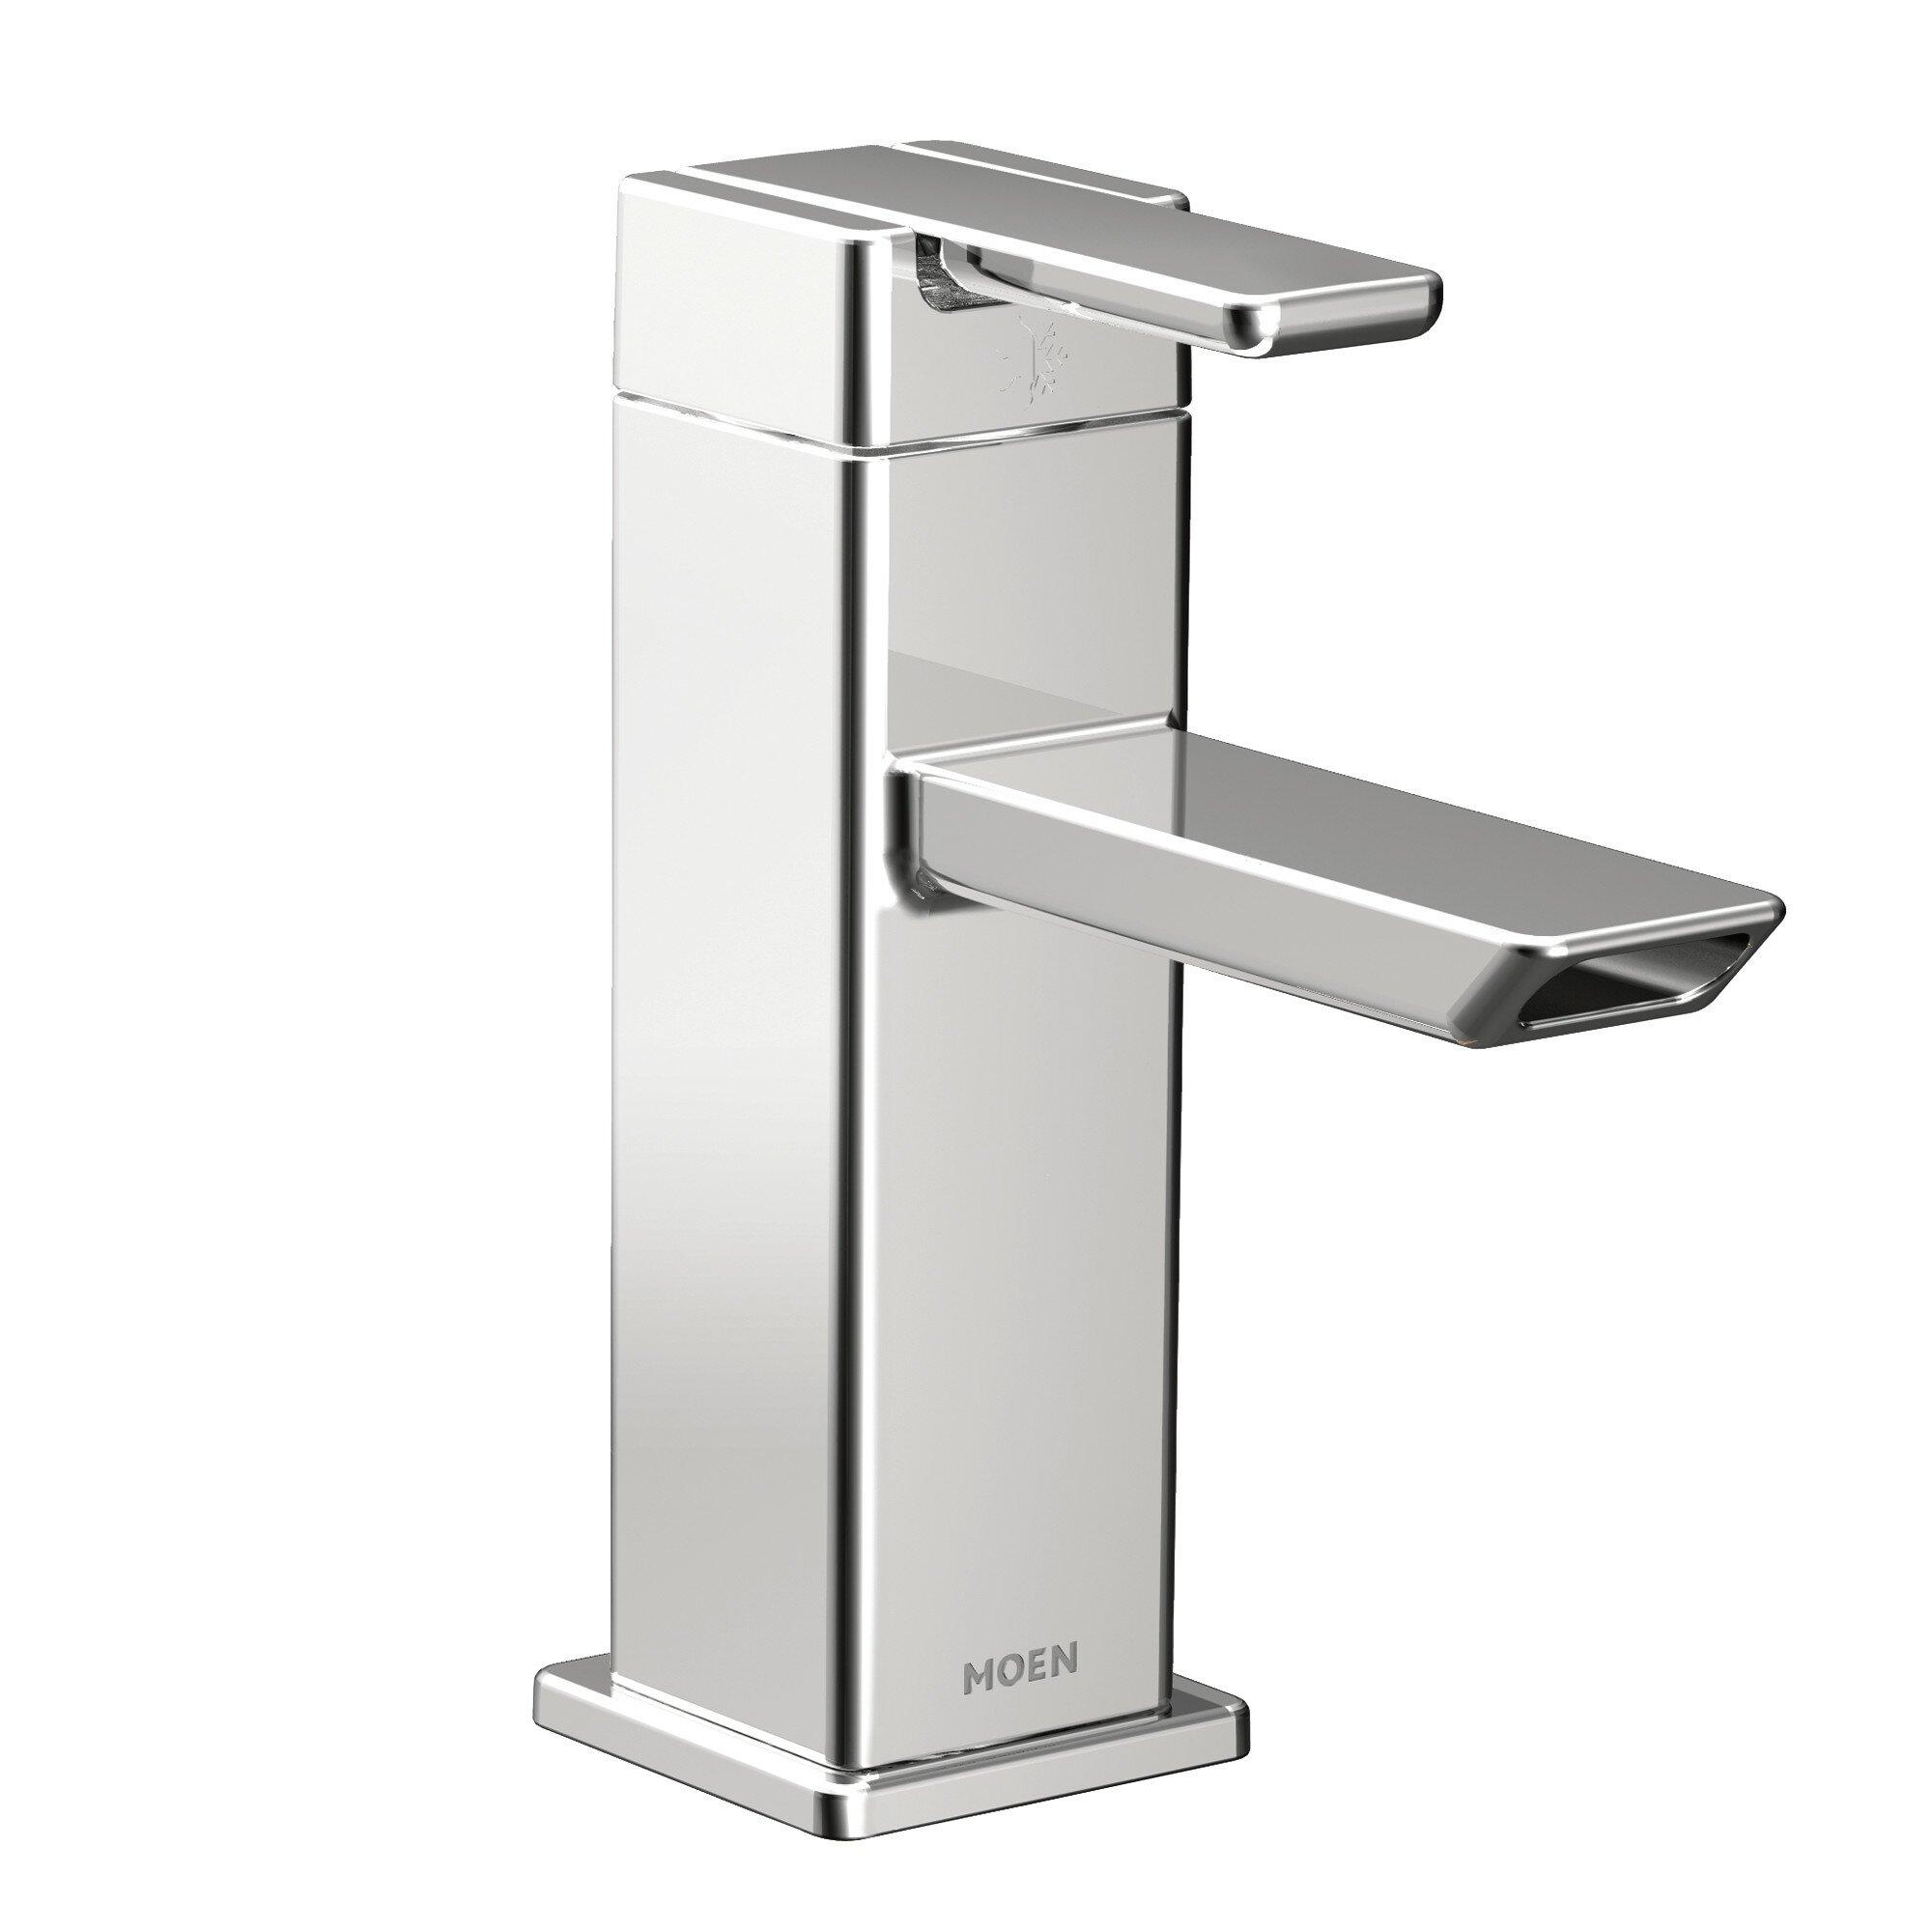 moen single lever bathroom faucet   My Web Value